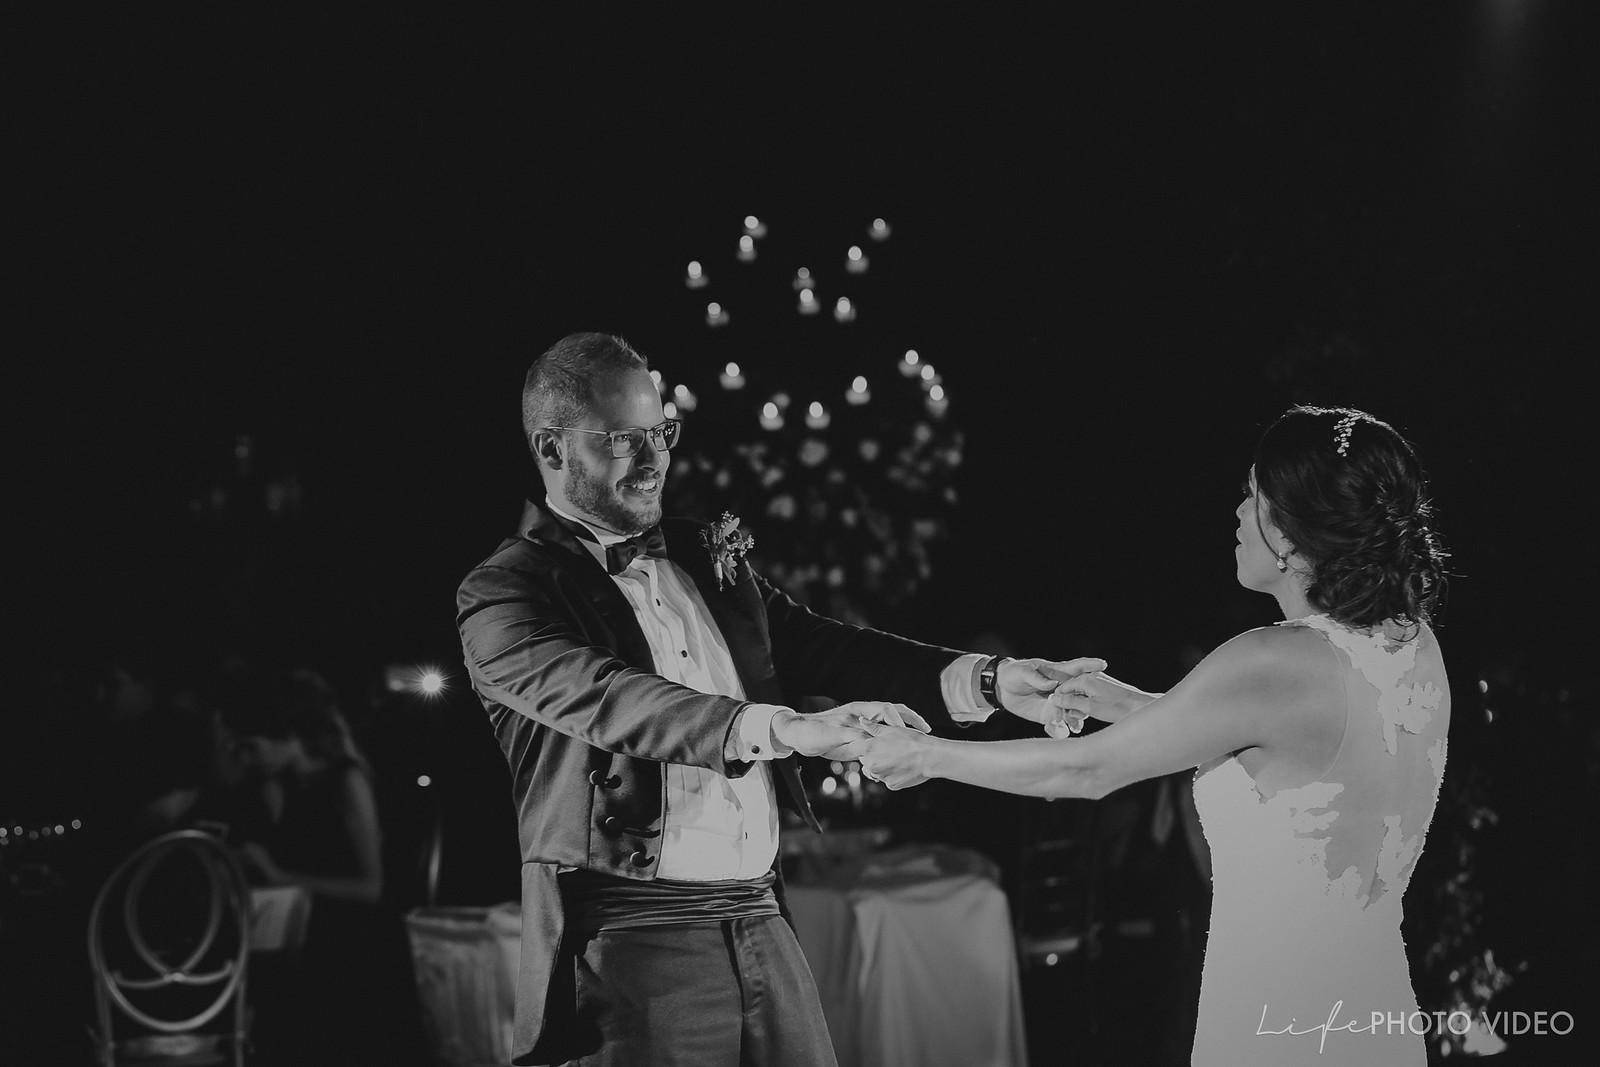 LifePhotoVideo_Boda_Guanajuato_Wedding_0057